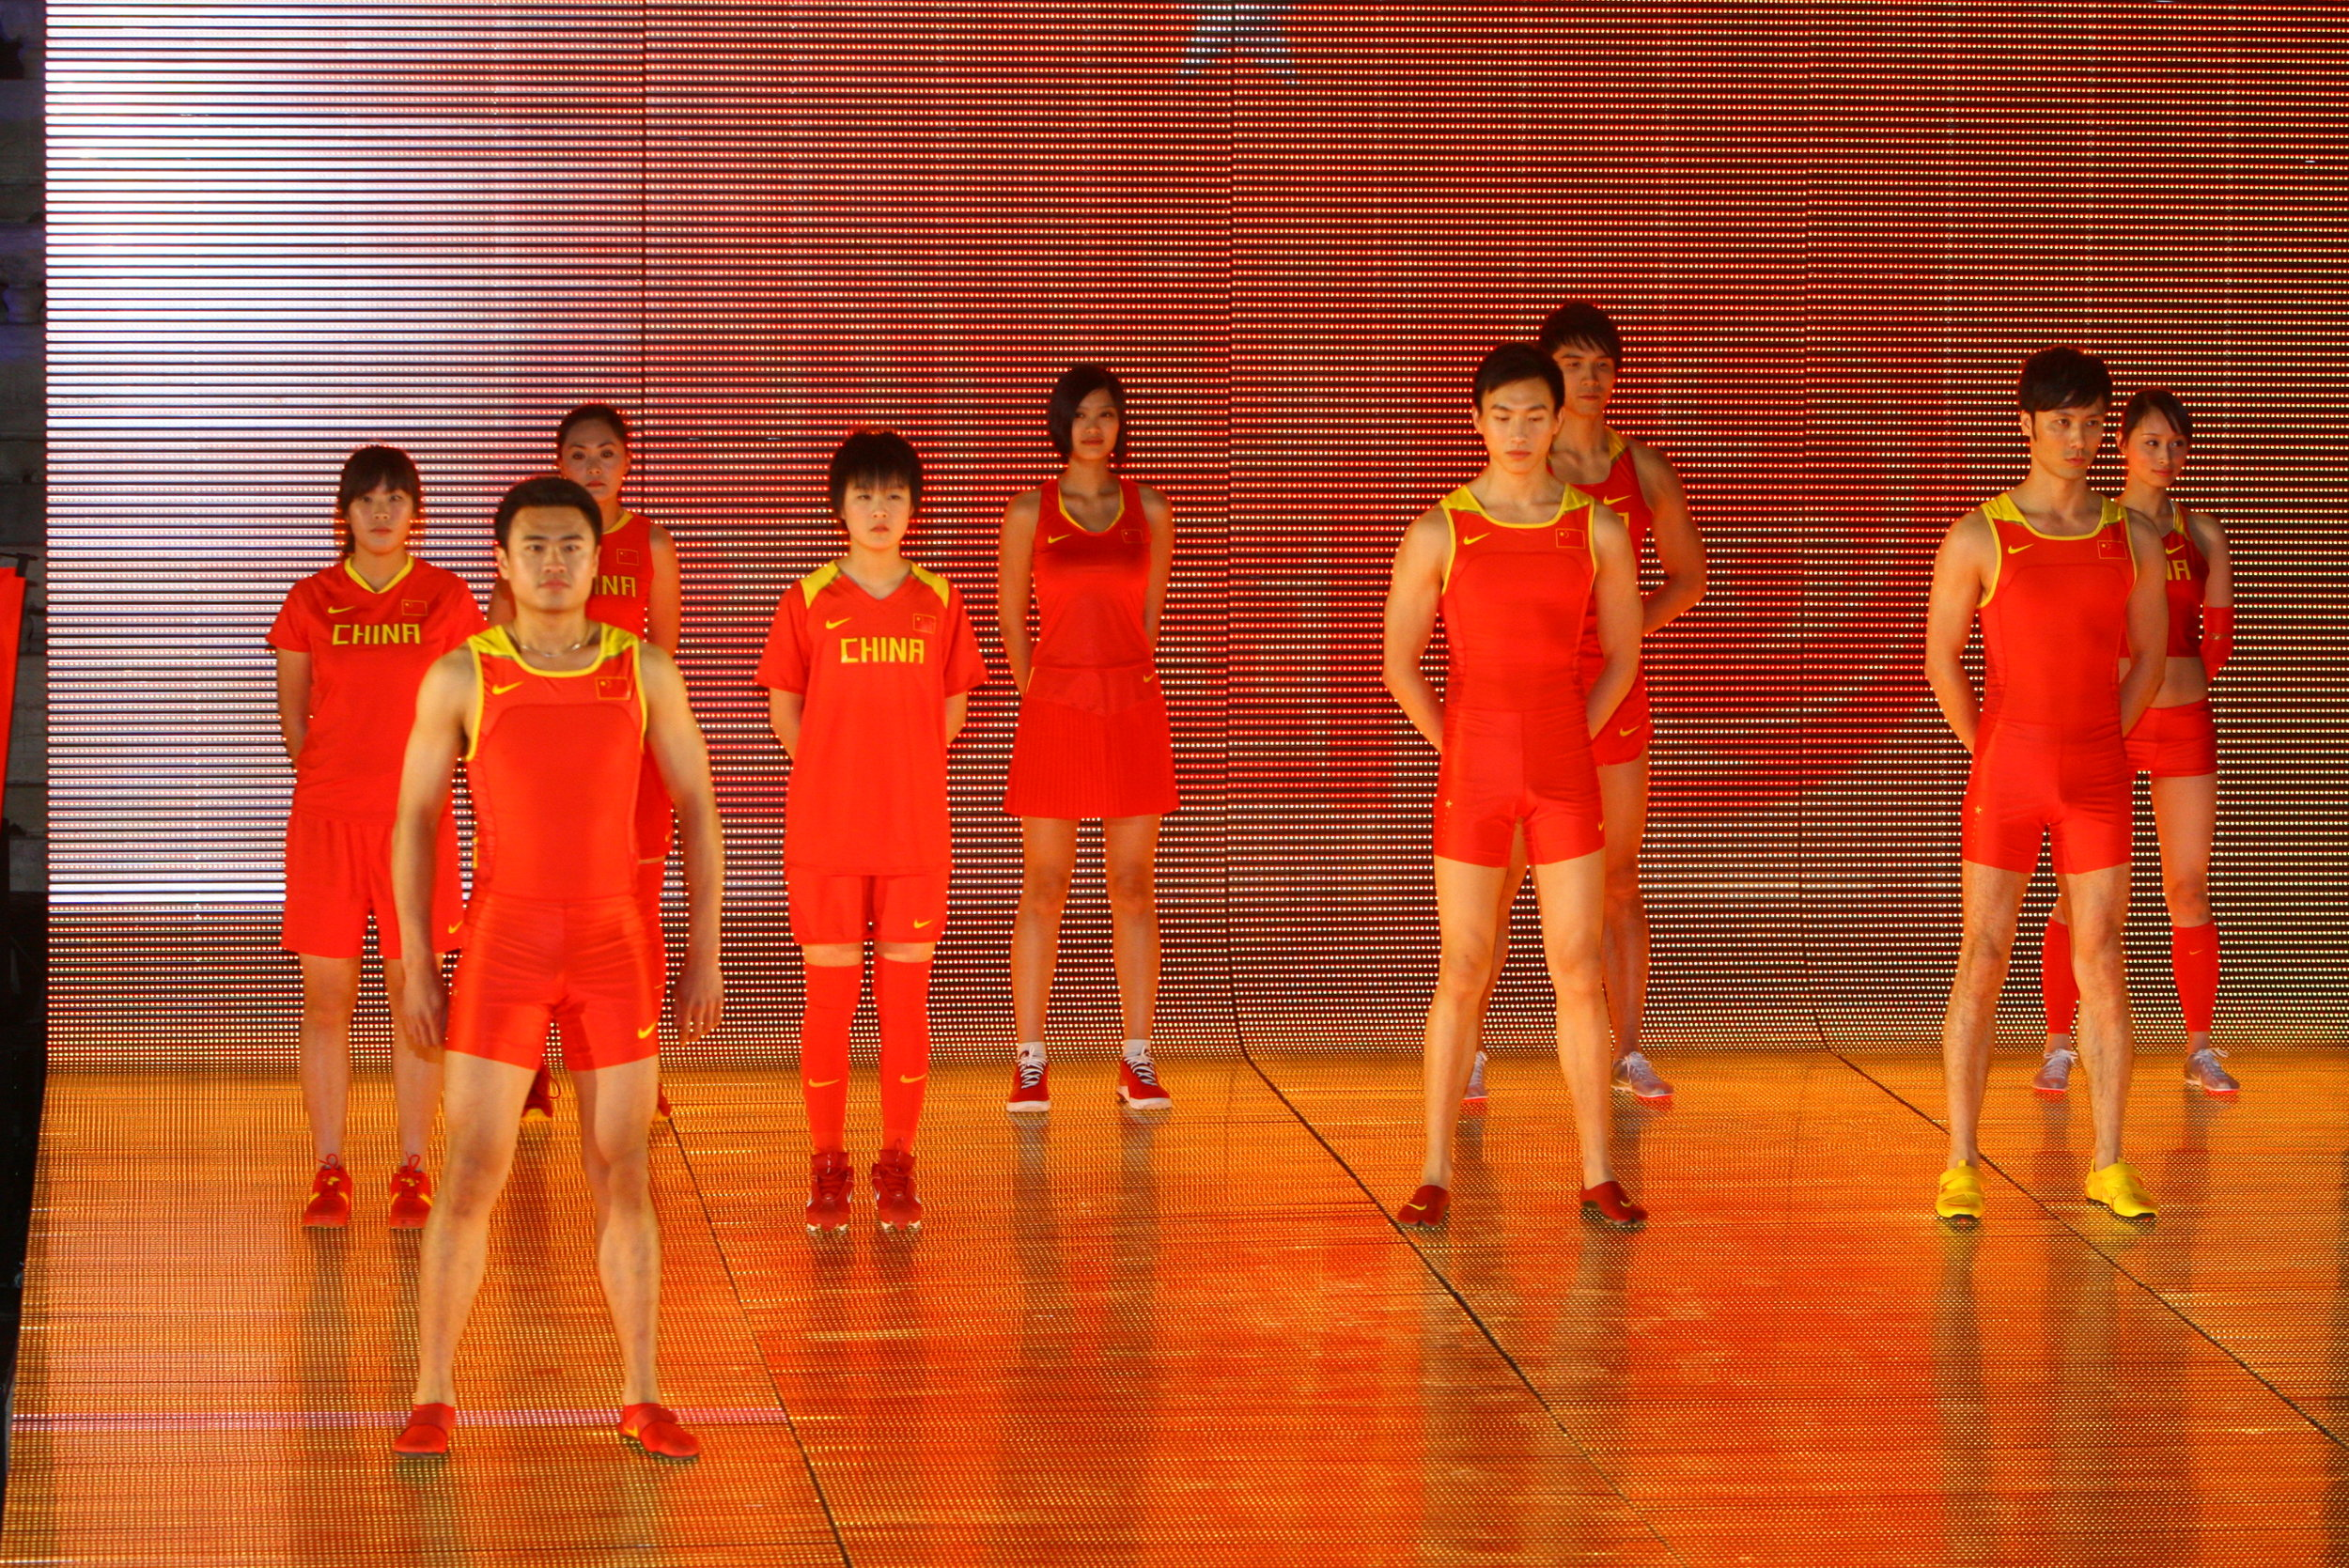 China Federations Uniforms.jpg